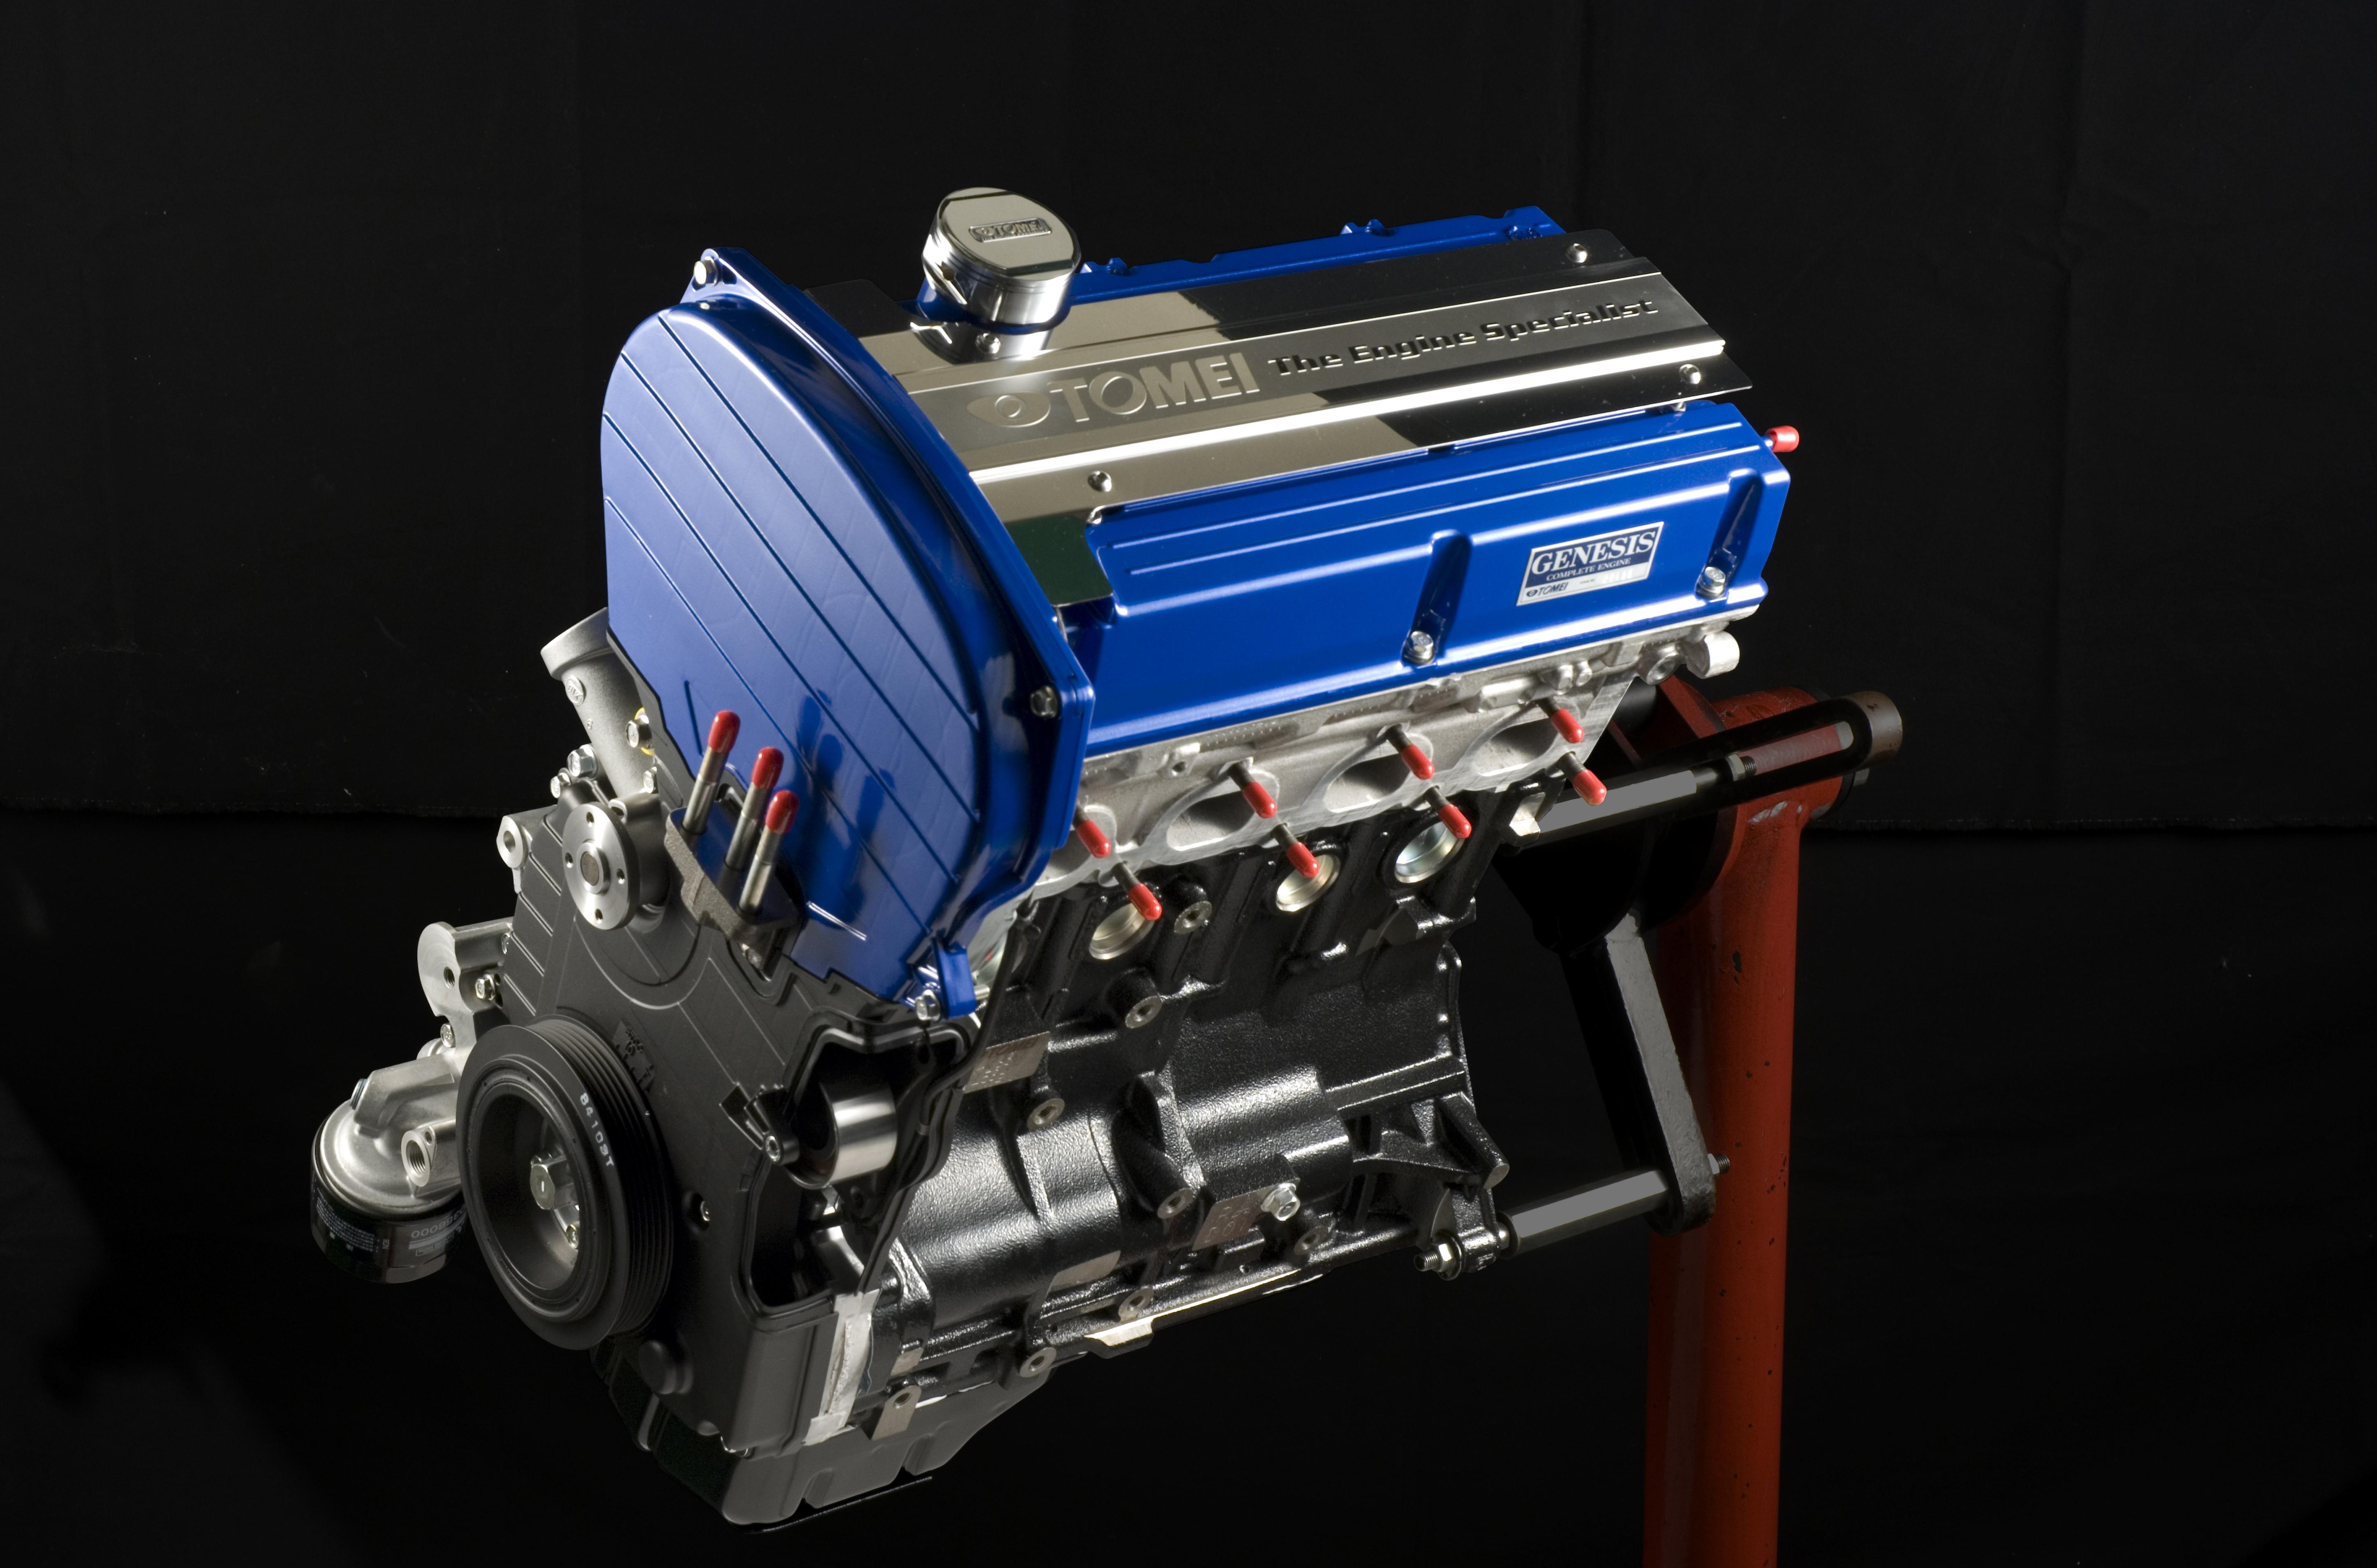 Tomei Genesis Complete Shortblock Assembly Mitsubishi Evolution VIII